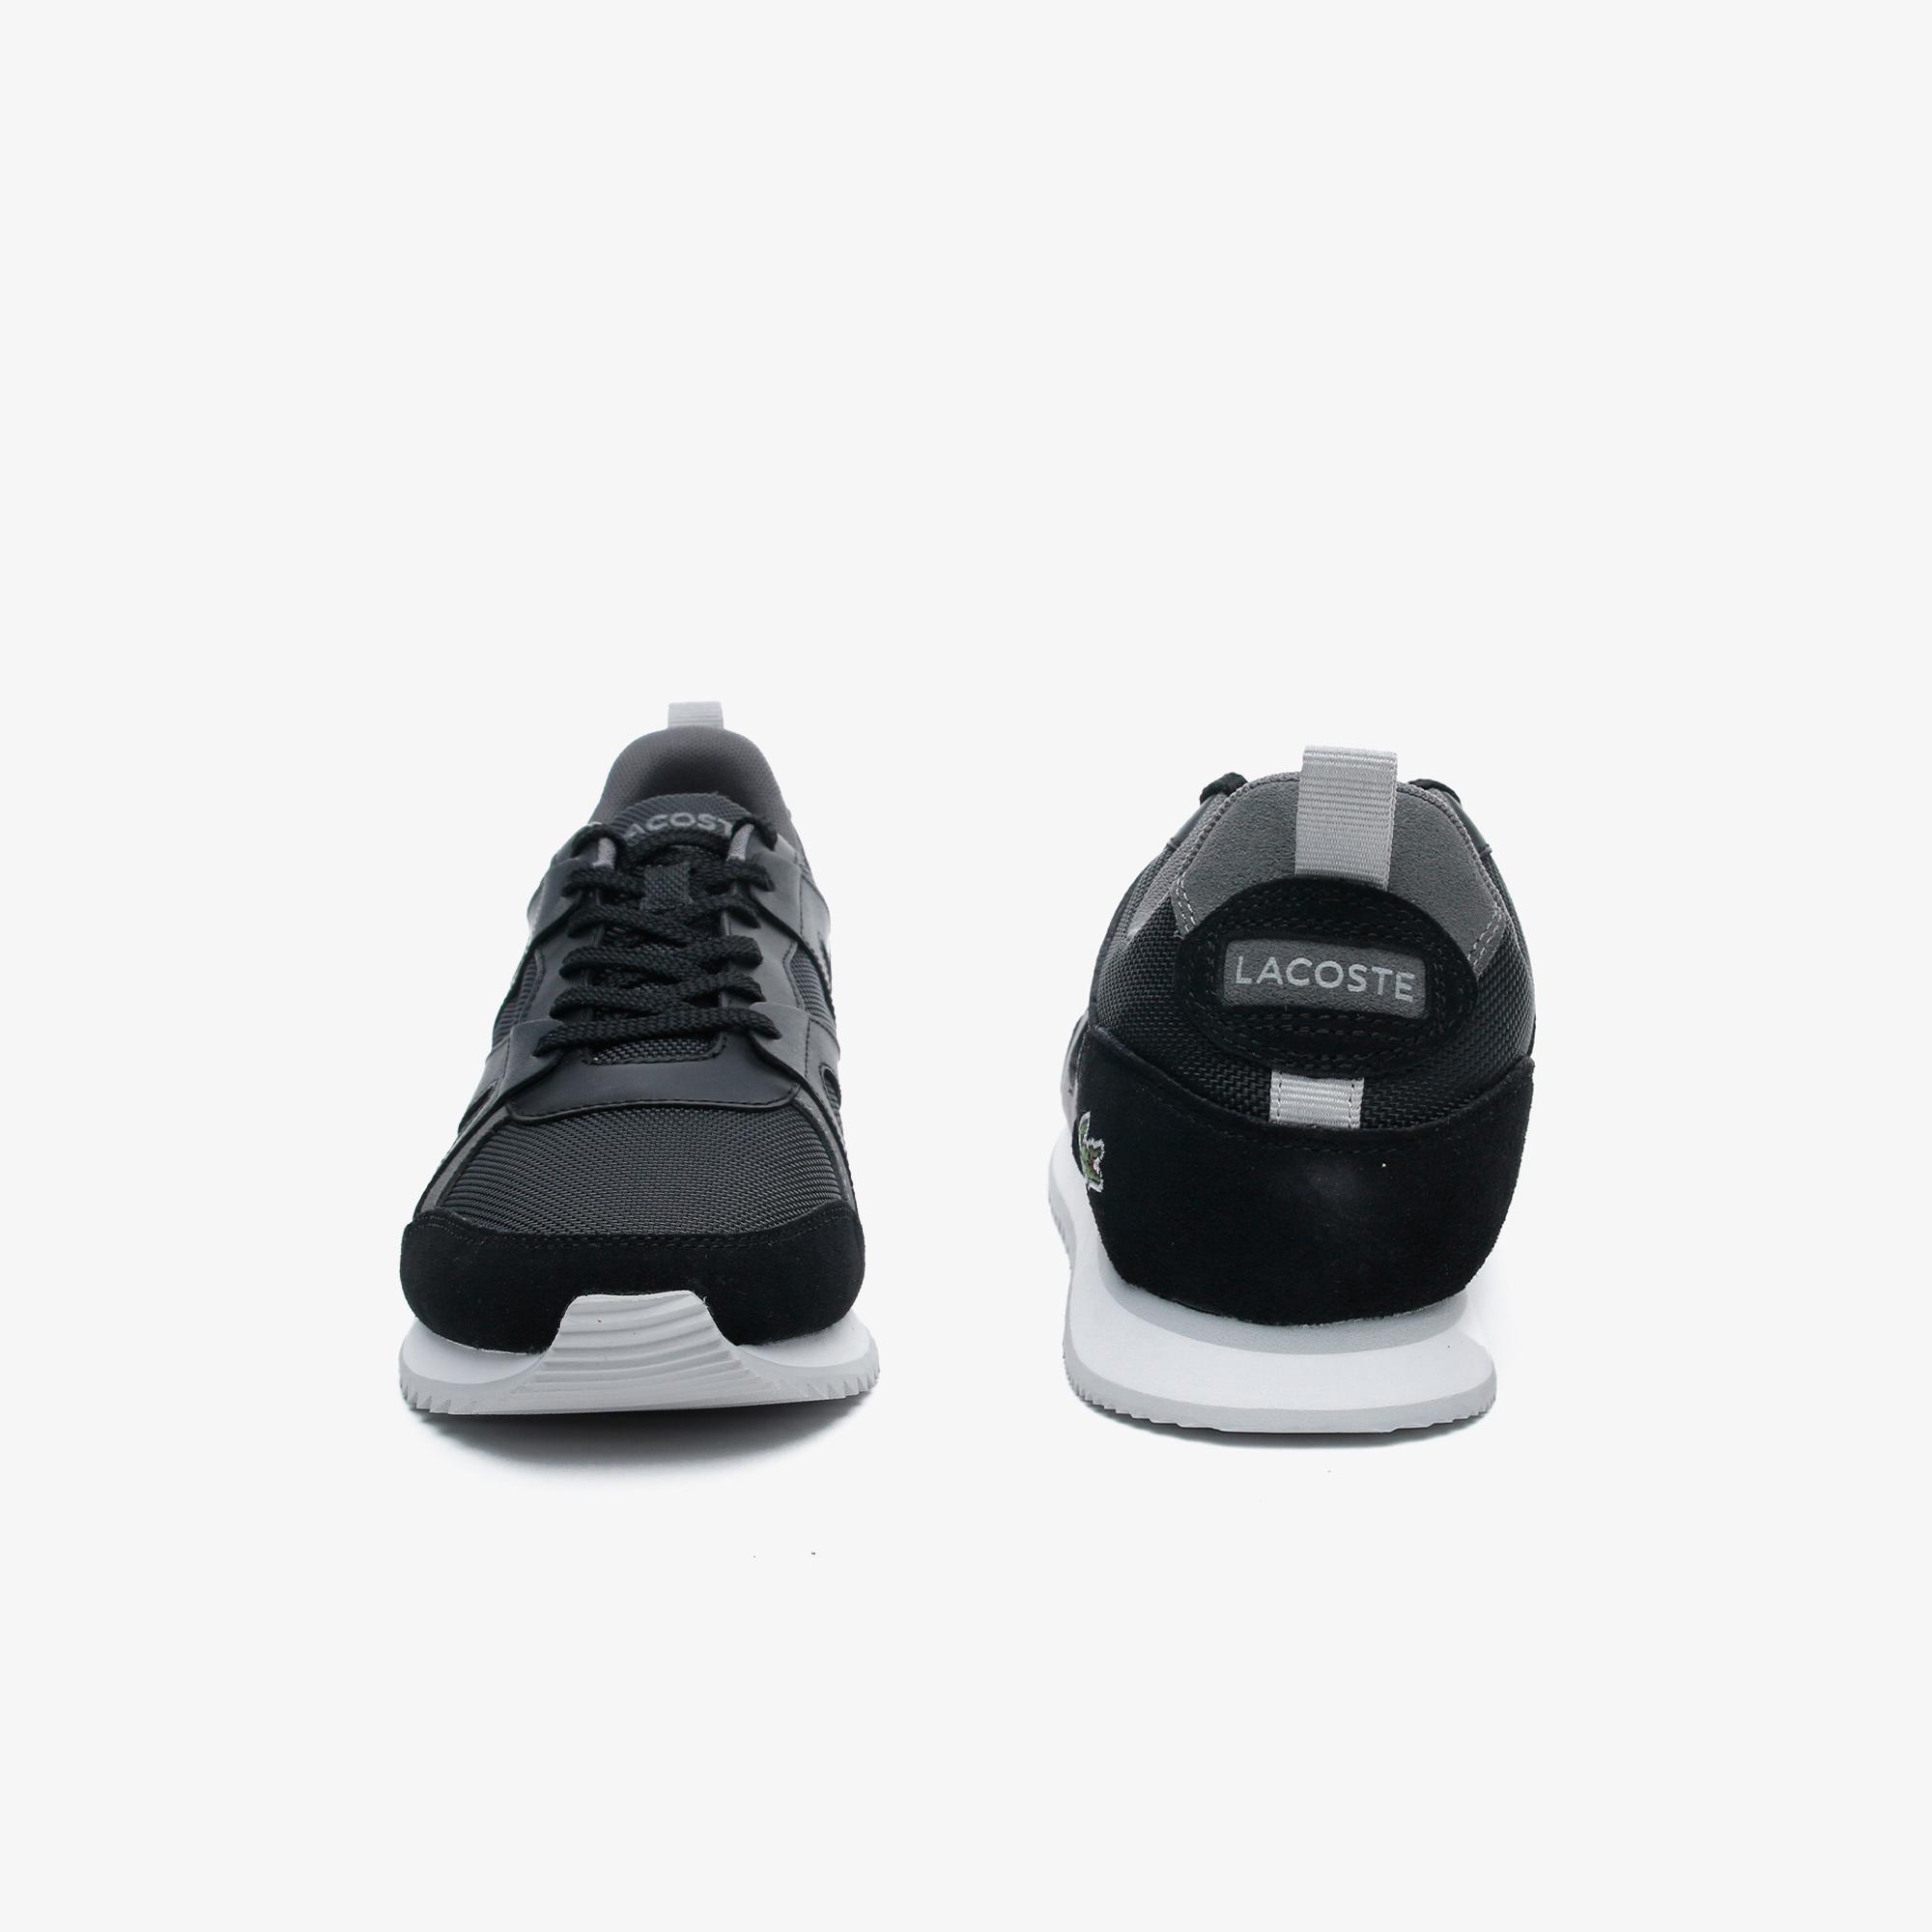 Lacoste Aesthet 120 2 Erkek Siyah - Gri Sneaker